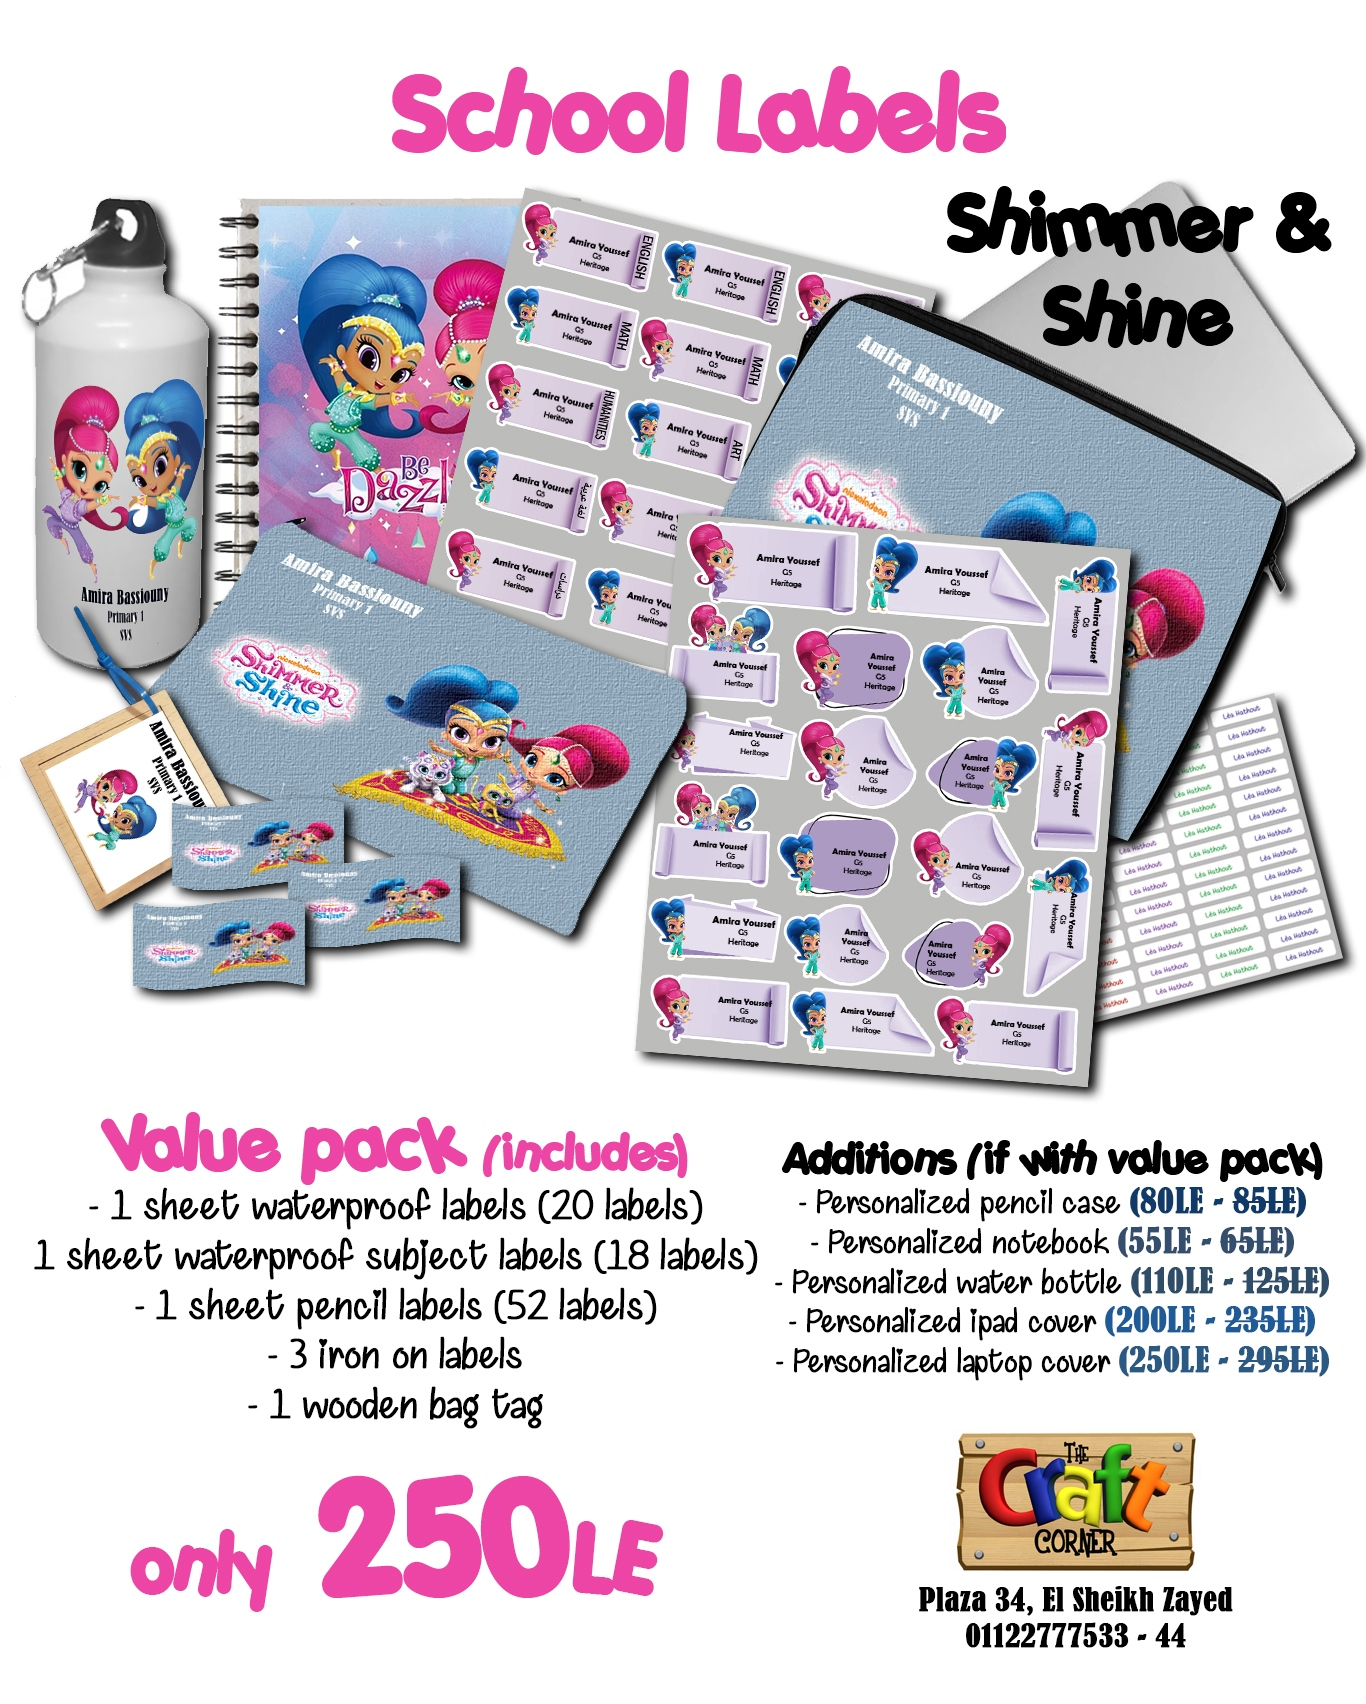 Shimmer & shine ad